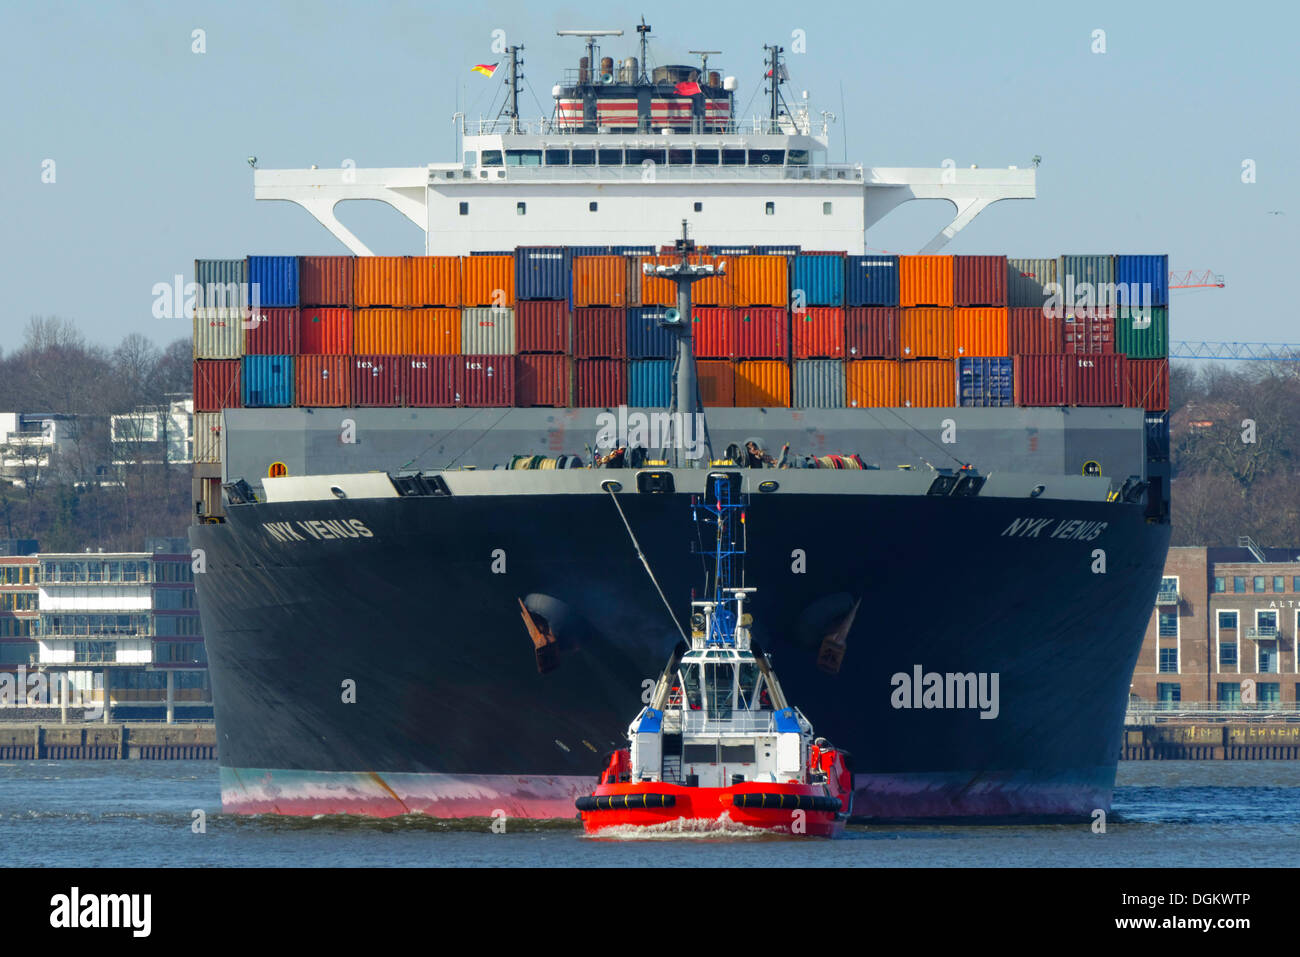 NYK Venus, container ship from the NYK Lines shipyard, Hamburg, Hamburg, Hamburg, Germany - Stock Image